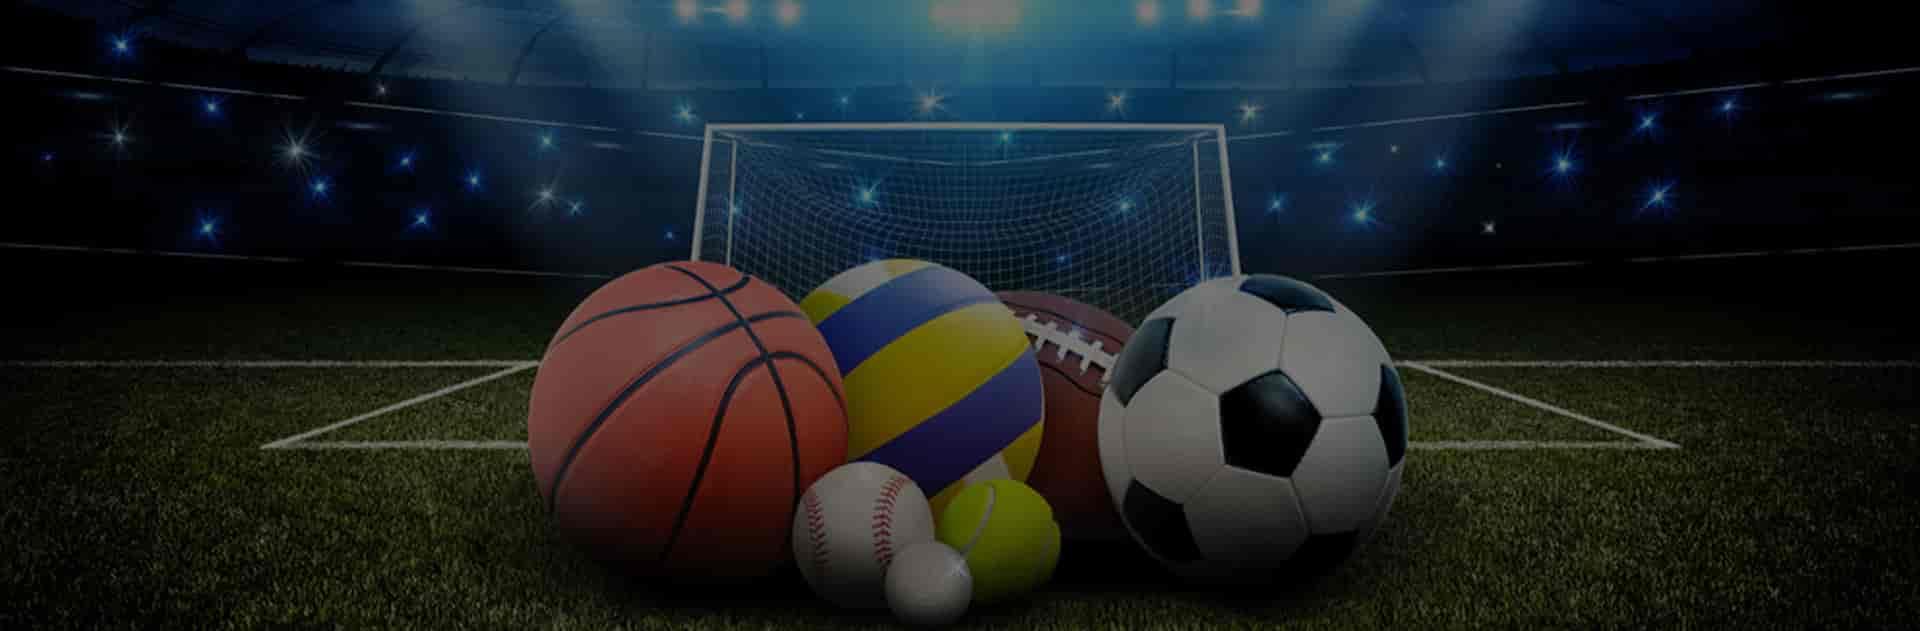 All Sports API - LiveScore API - Sports Feeds - Sports Data